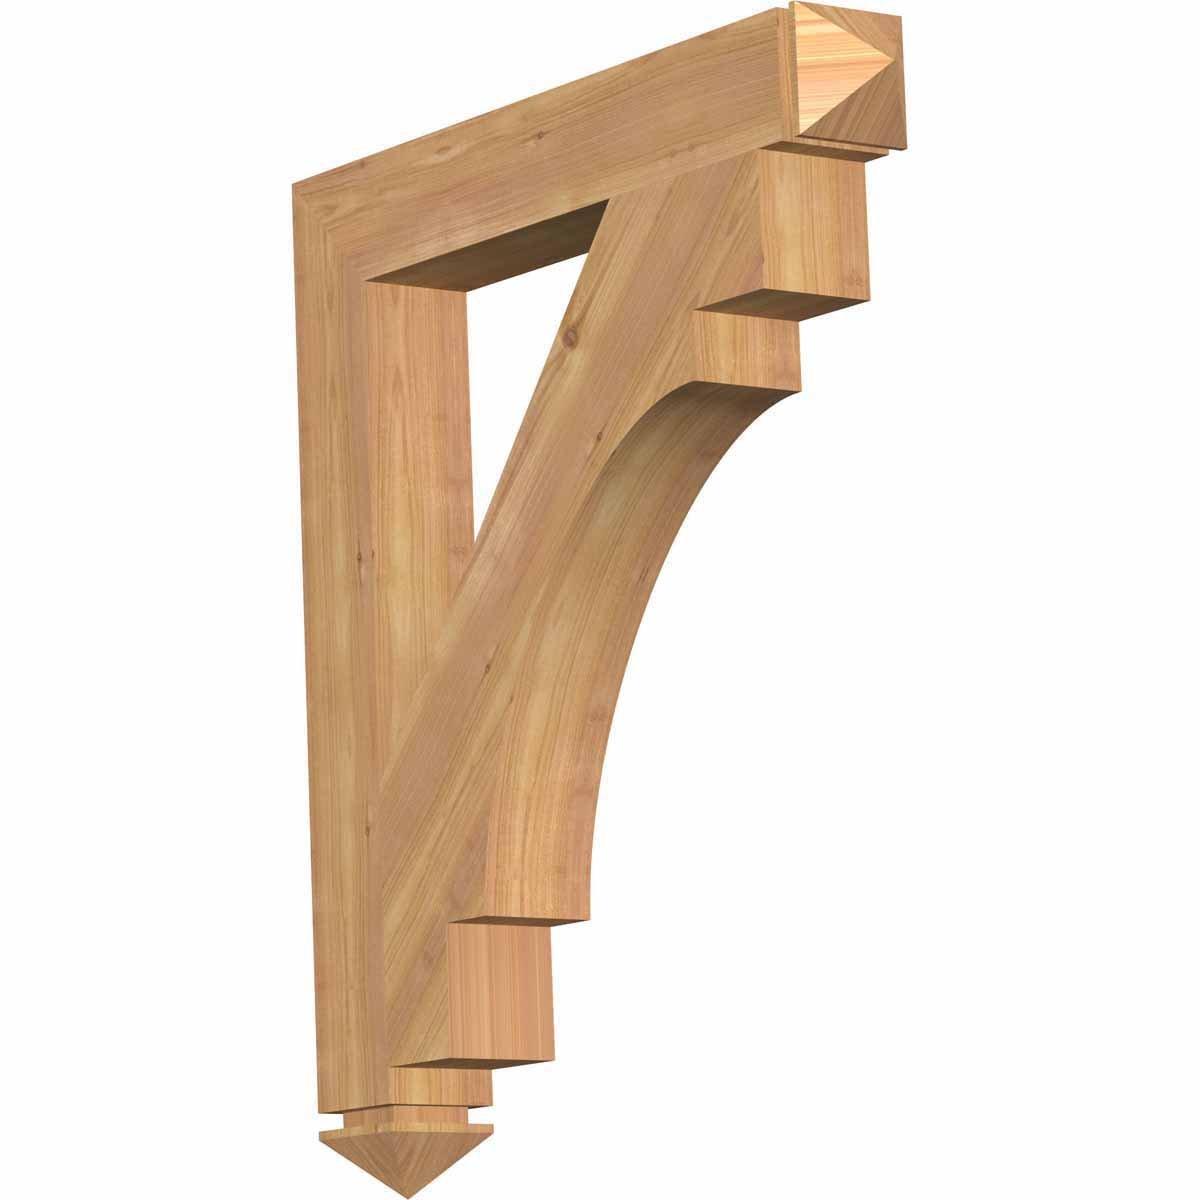 Ekena Millwork BKT04X26X30MRC03SWR Merced Arts & Crafts Smooth Bracket, 3.5'' Width x 26'' Depth x 30'' Height, Western Red Cedar